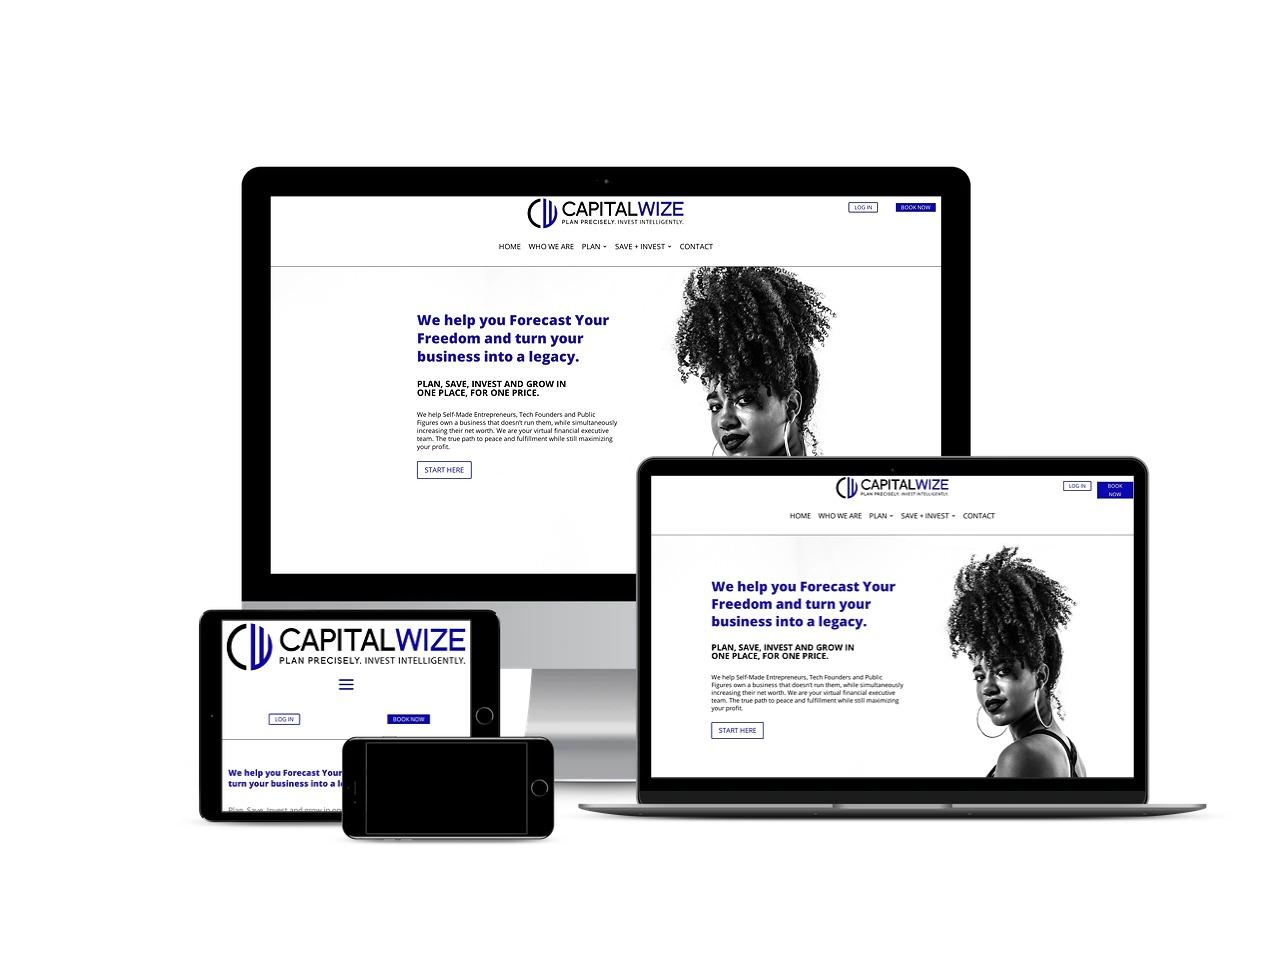 capital wize poc people of color financial advisor website